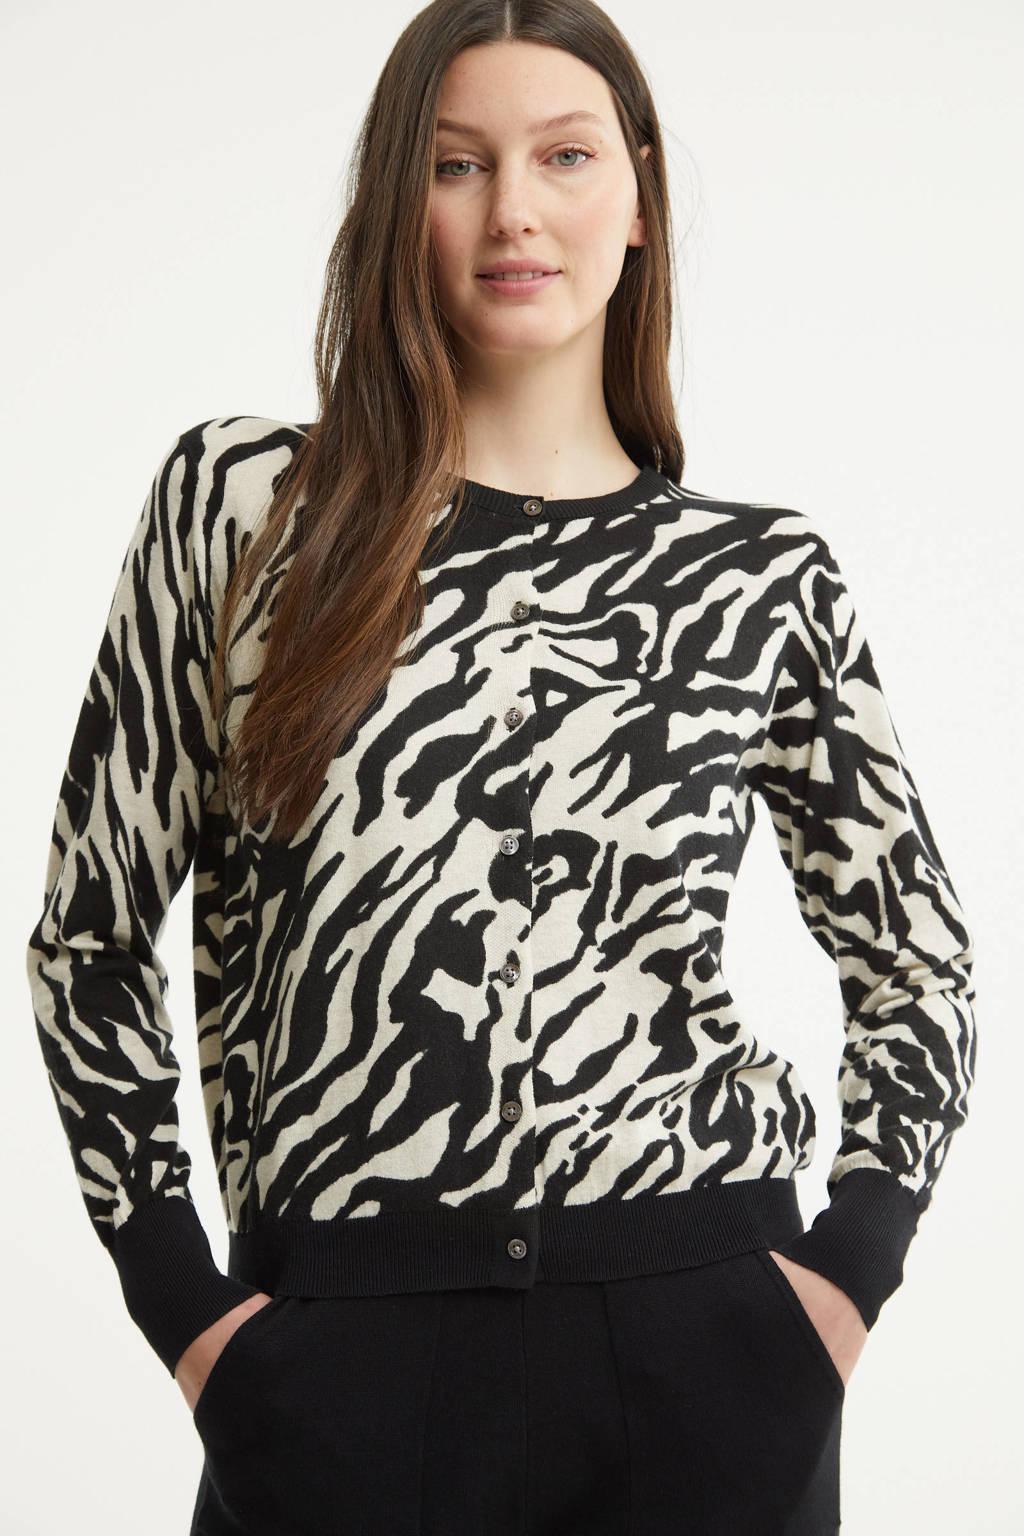 Summum Woman vest met zebraprint zwart/zand, Zwart/zand